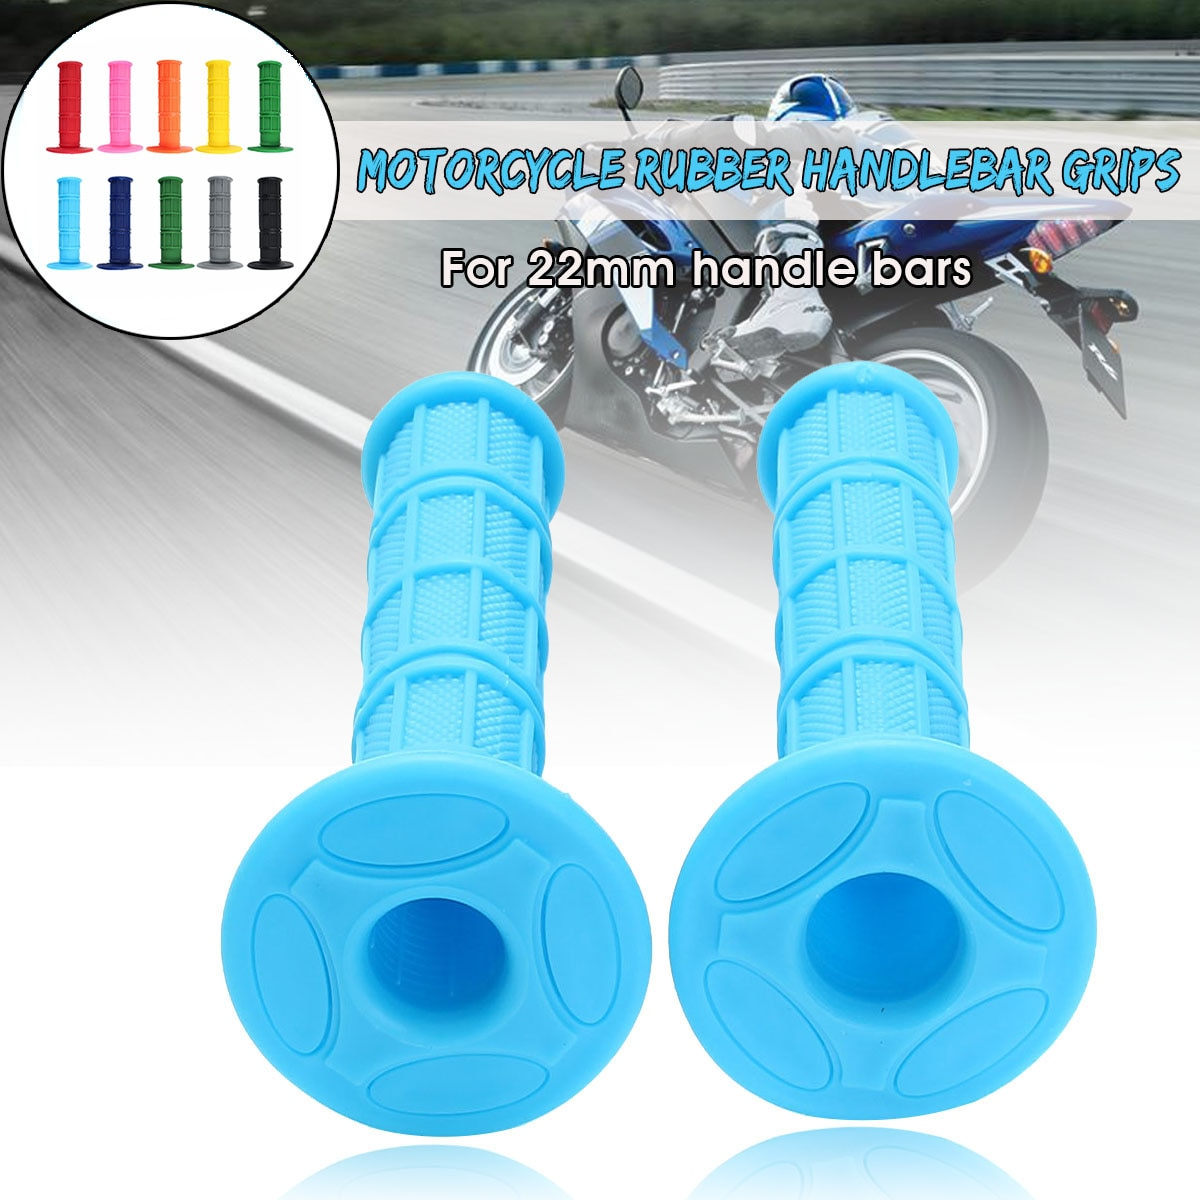 "Manillar de goma Universal para motocicleta de 22mm y 7/8 "", manillares de mano para motocicleta CRF YZF WRF KXF KLX RMZ Pit Dirt Bike Motocross"